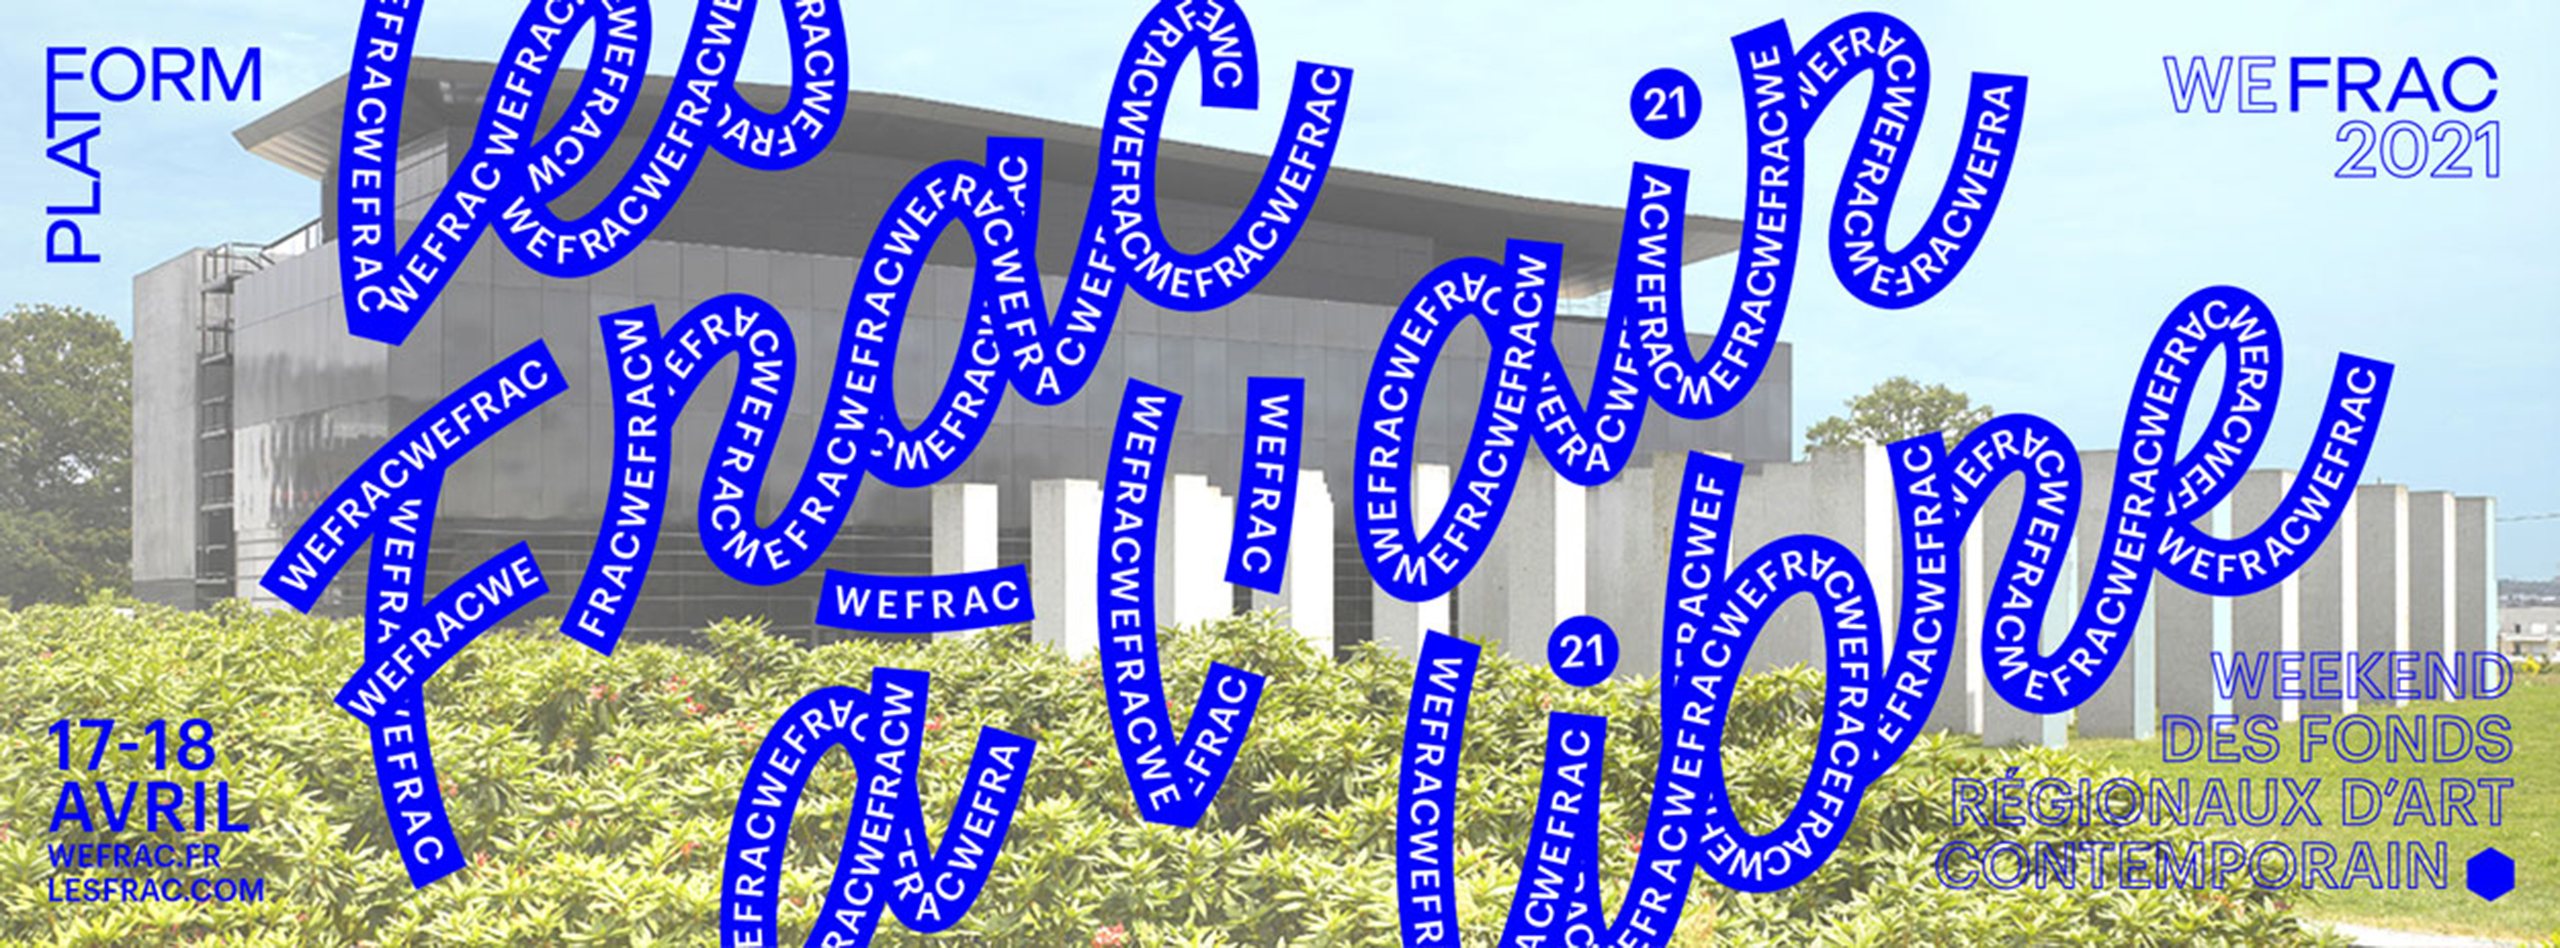 WEFRAC 2021